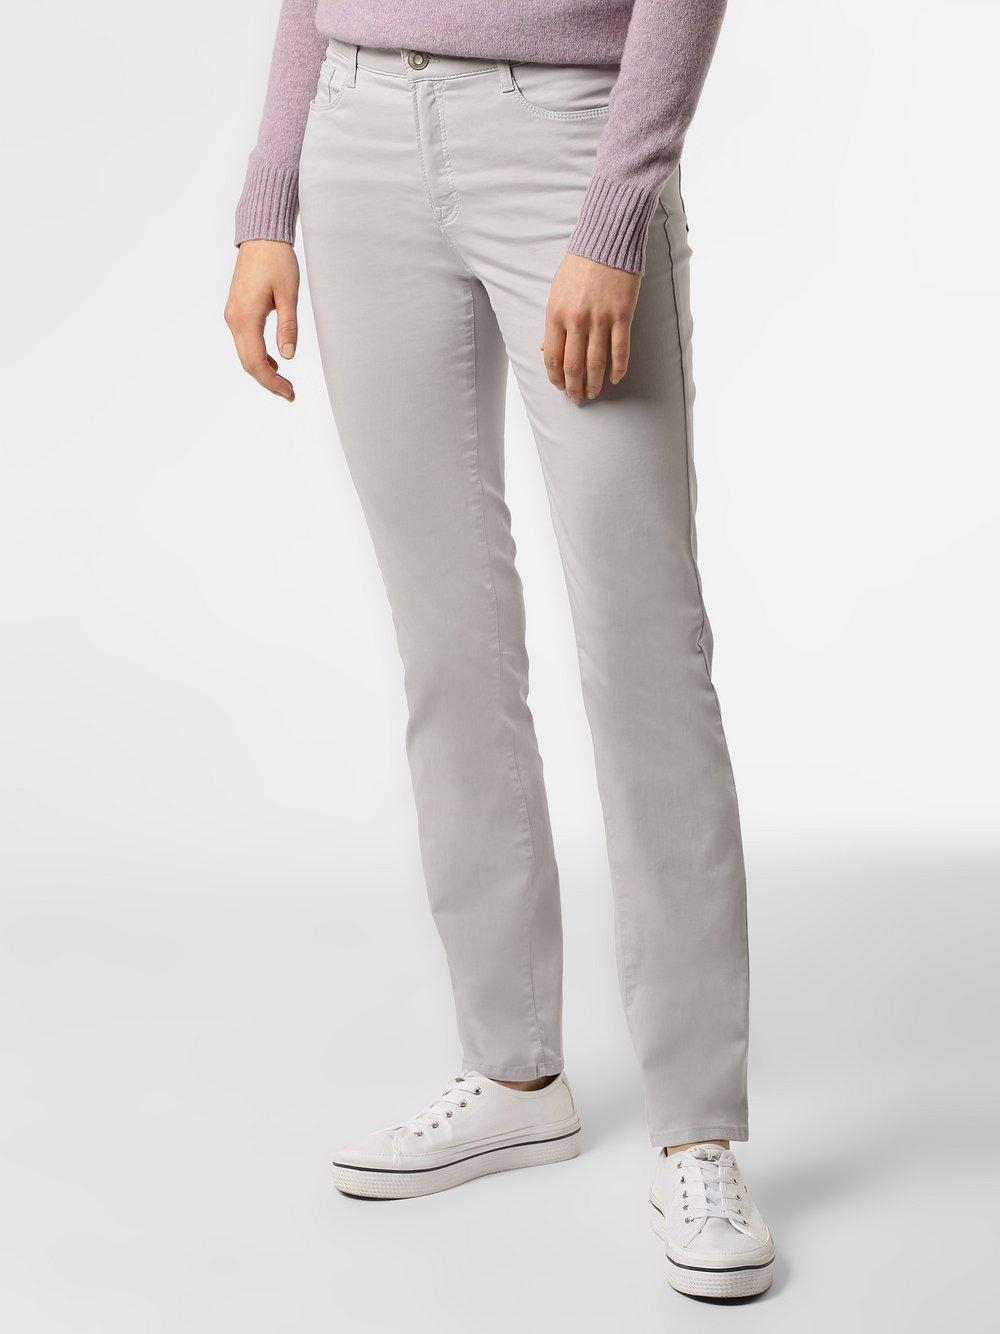 BRAX - Spodnie damskie – Mary, szary